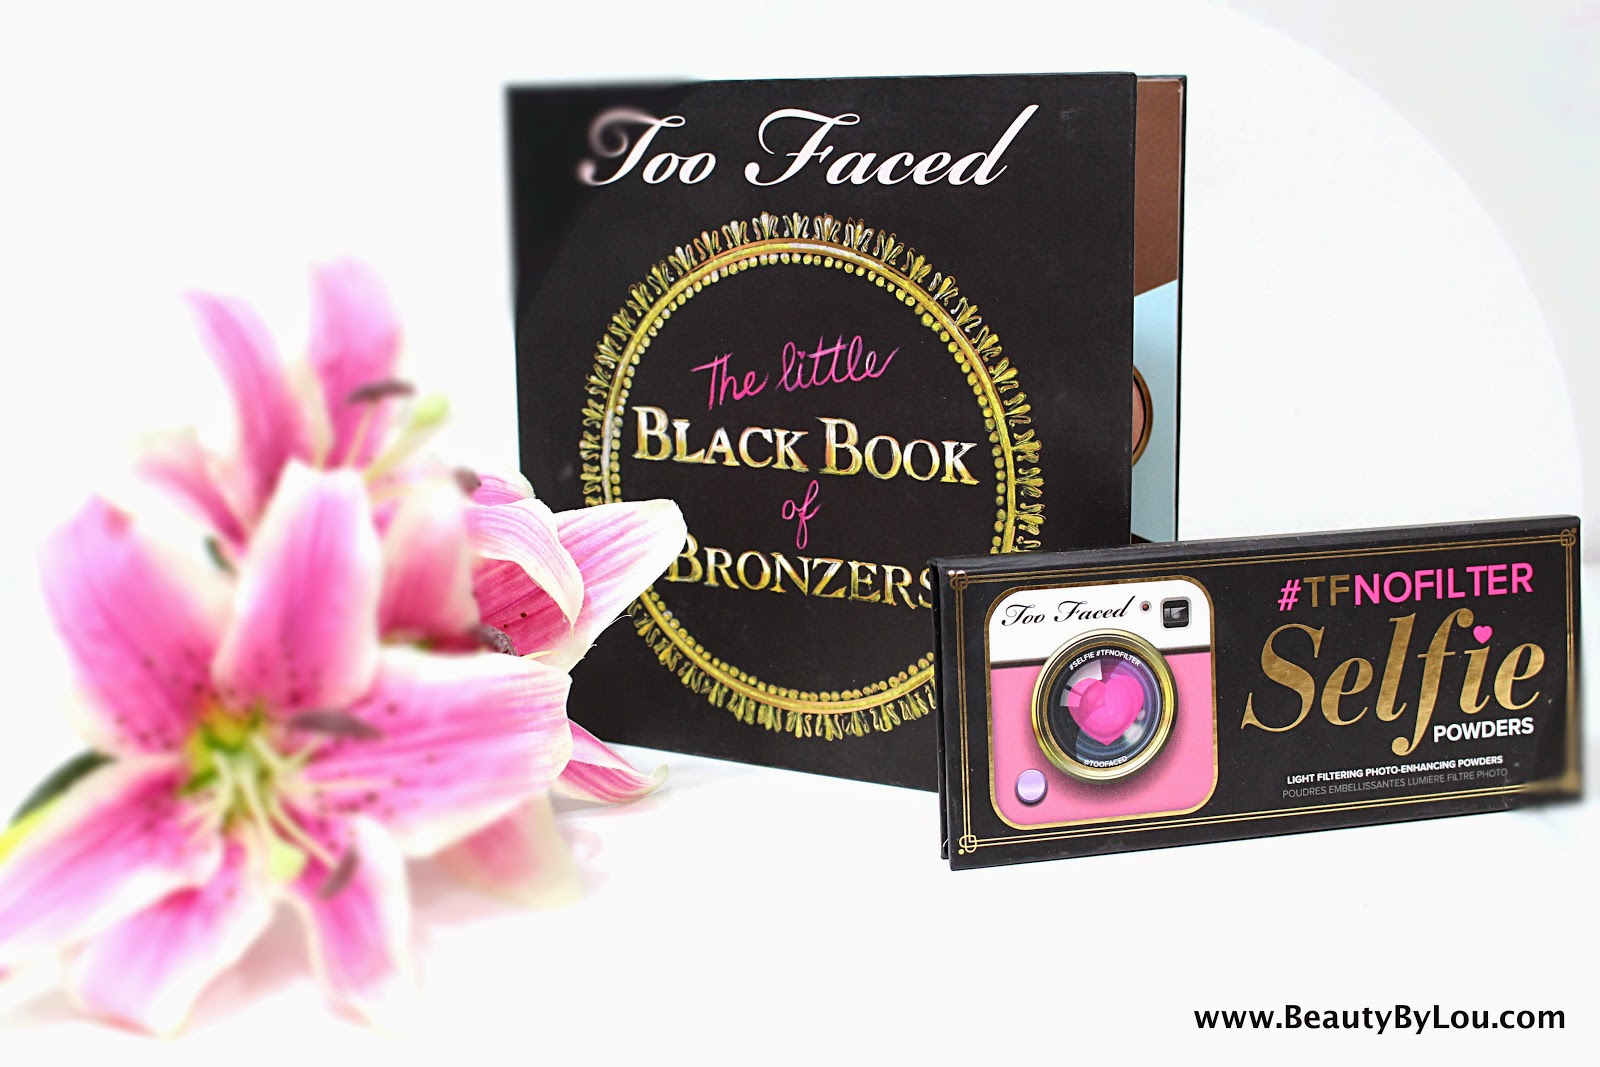 http://www.beautybylou.com/2015/04/nouveautes-too-faced-little-black-book-of-bronzers-et-selfie-powders-palette-avis-revue-swatchs.html